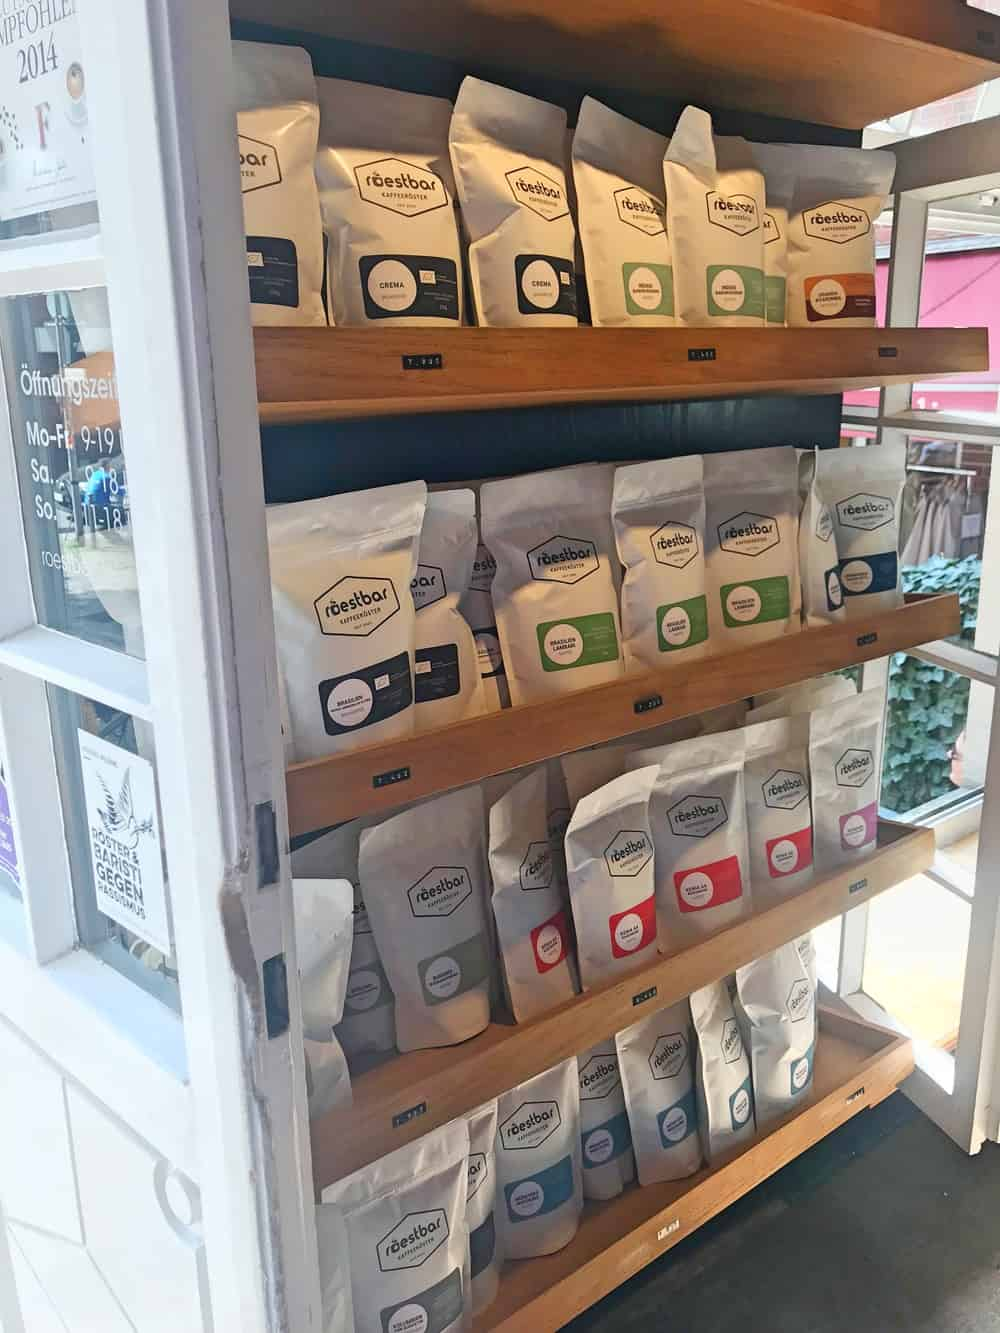 CAFÉ RÖSTBAR IN MÜNSTER